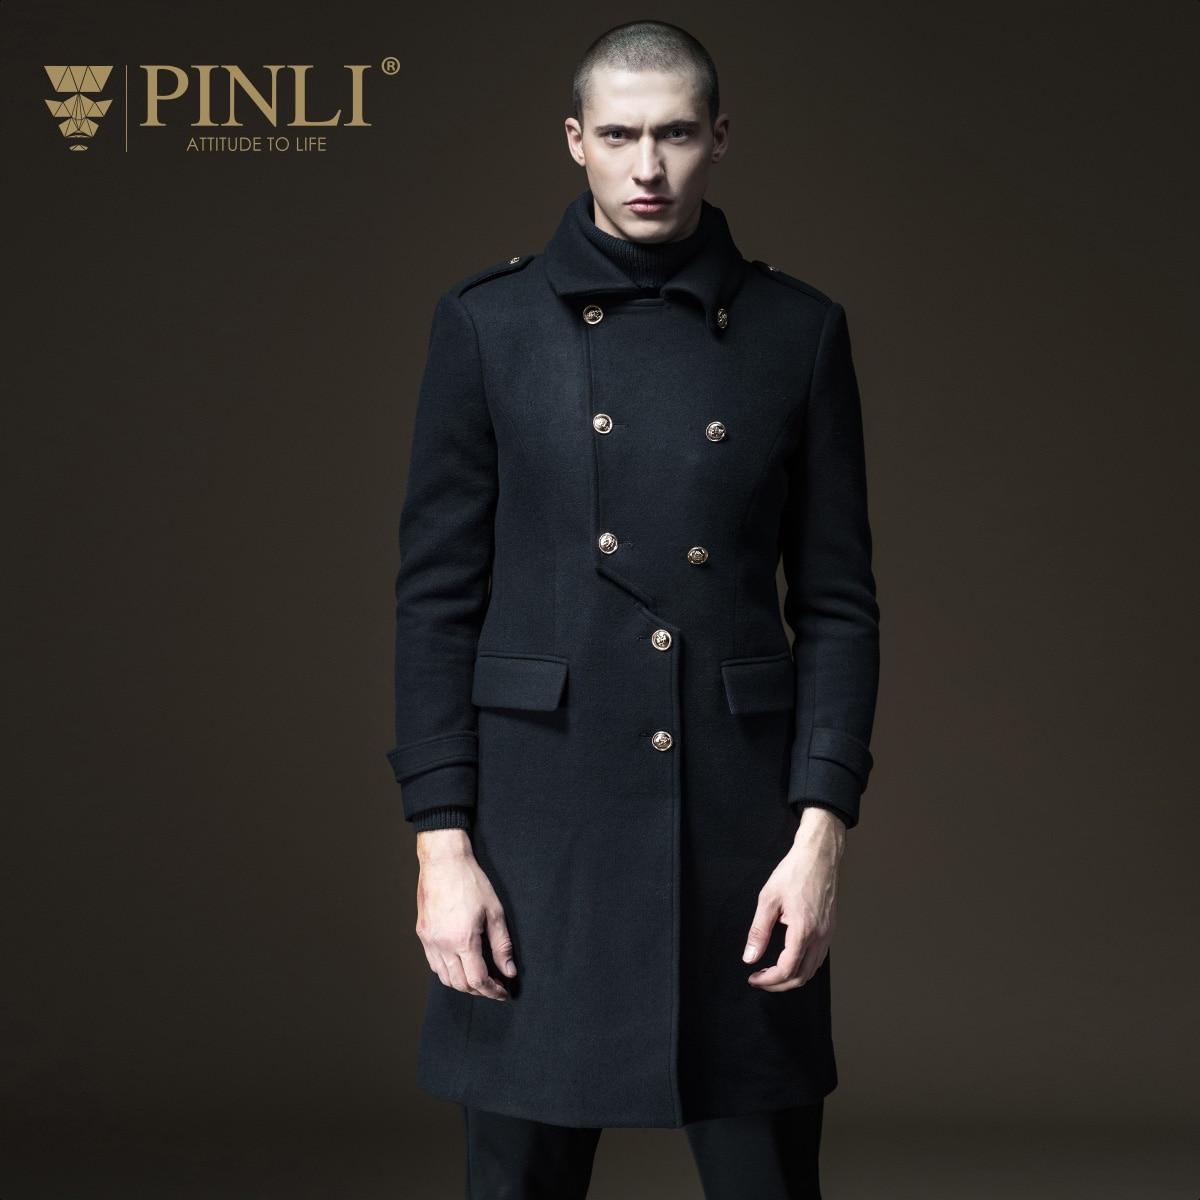 2019 100% Wolle Palto Masculino Pinli Produkt Maß Neue Männer Pflegen Moral In Die Warme Herbst Lange Wolle Mantel B173502113